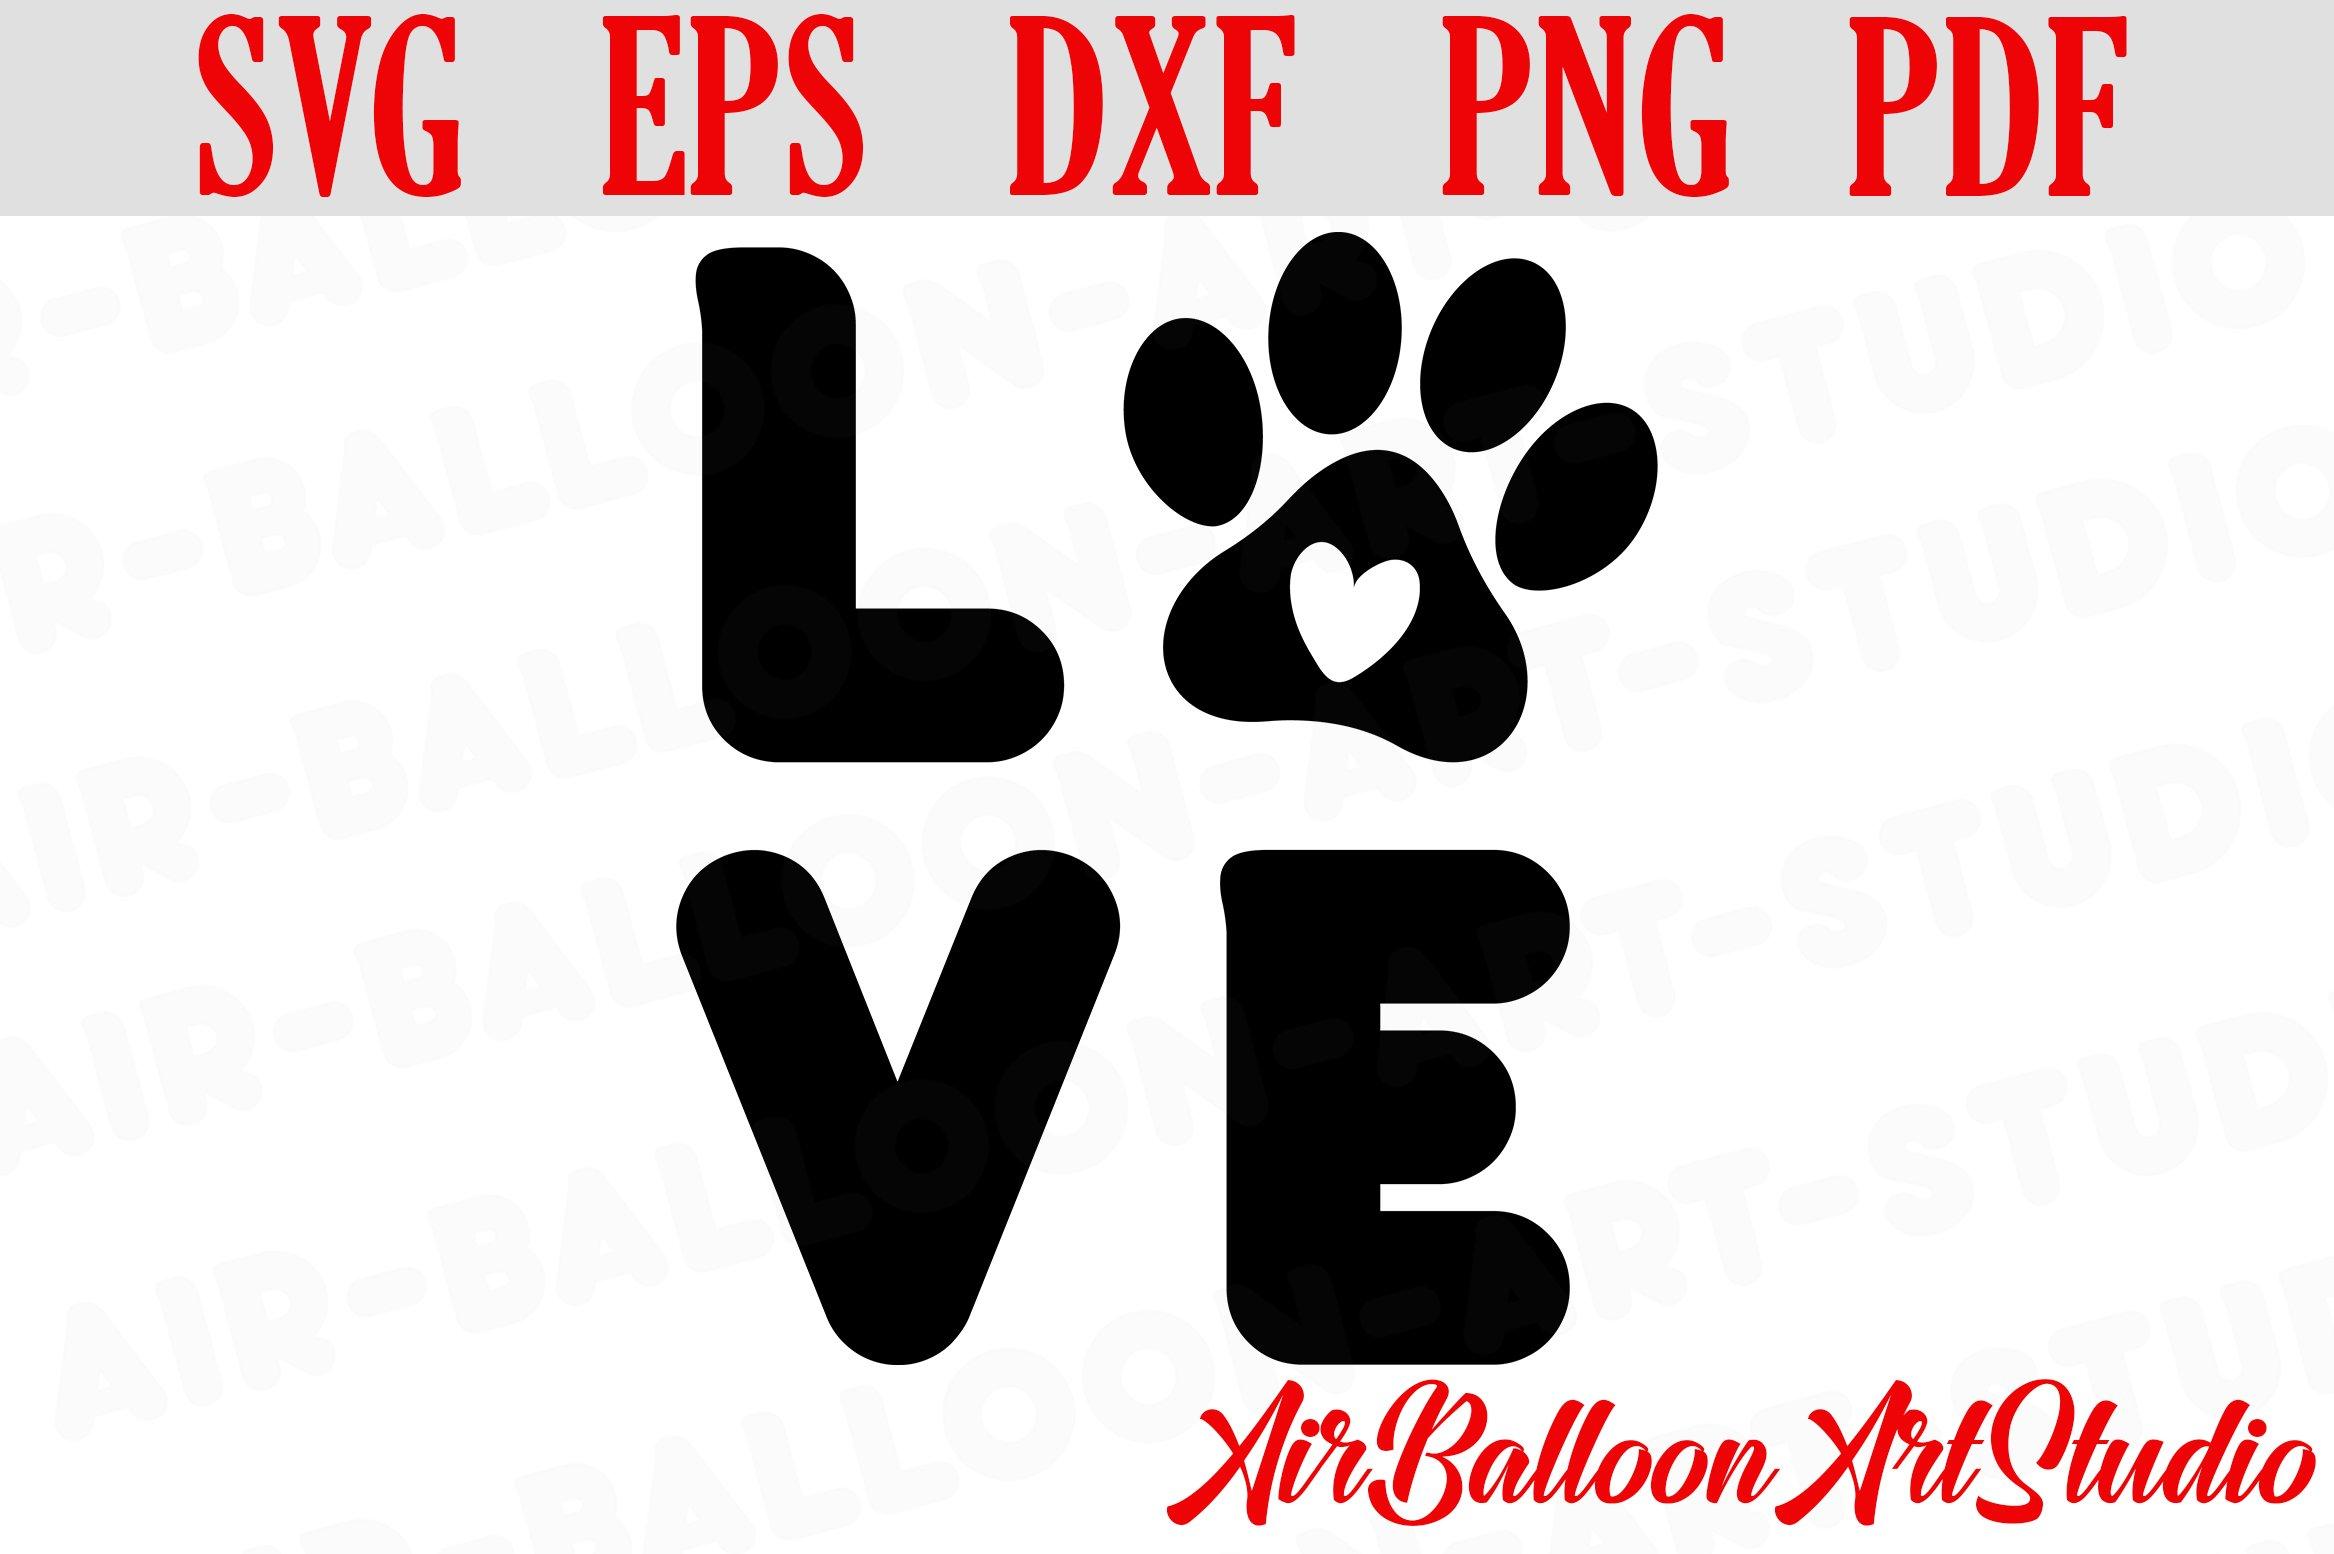 Paw Print Svg Love Paw Svg Love Dog Svg Paw Print Dog Svg 665687 Cut Files Design Bundles